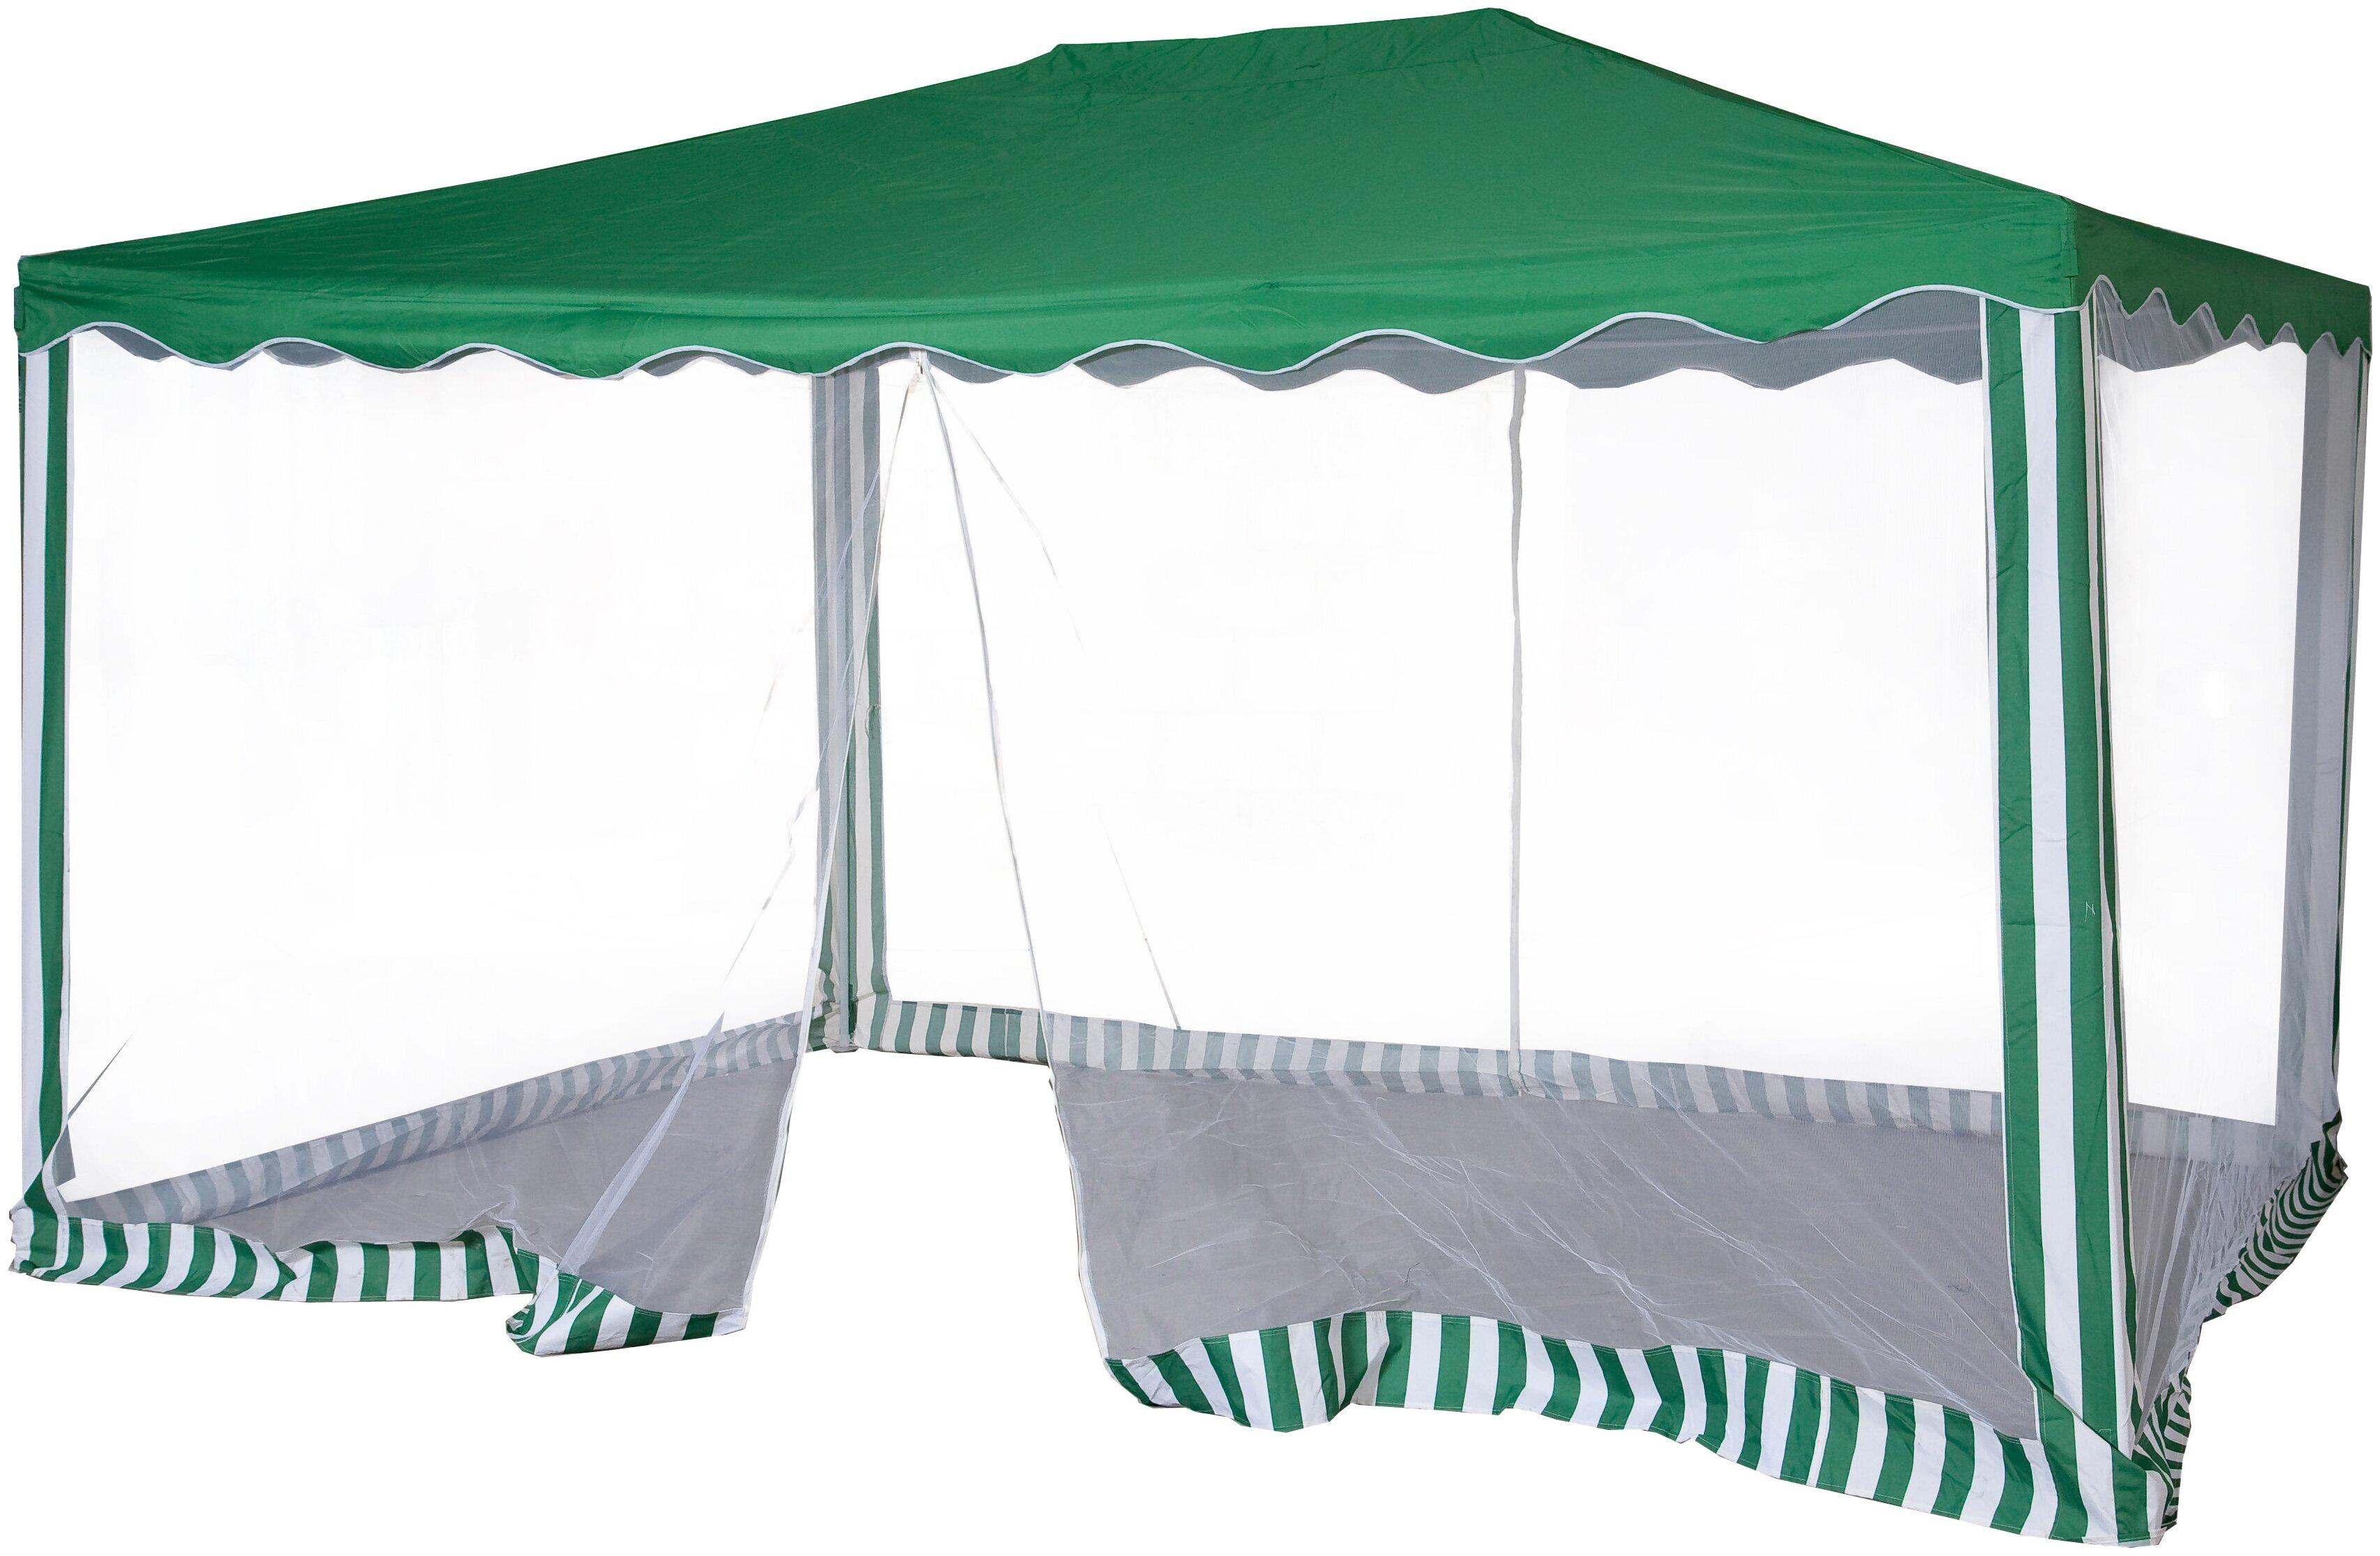 Шатер Green Glade 1088, со стенками и москитной сеткой, 3 х 4 х 2.5 м